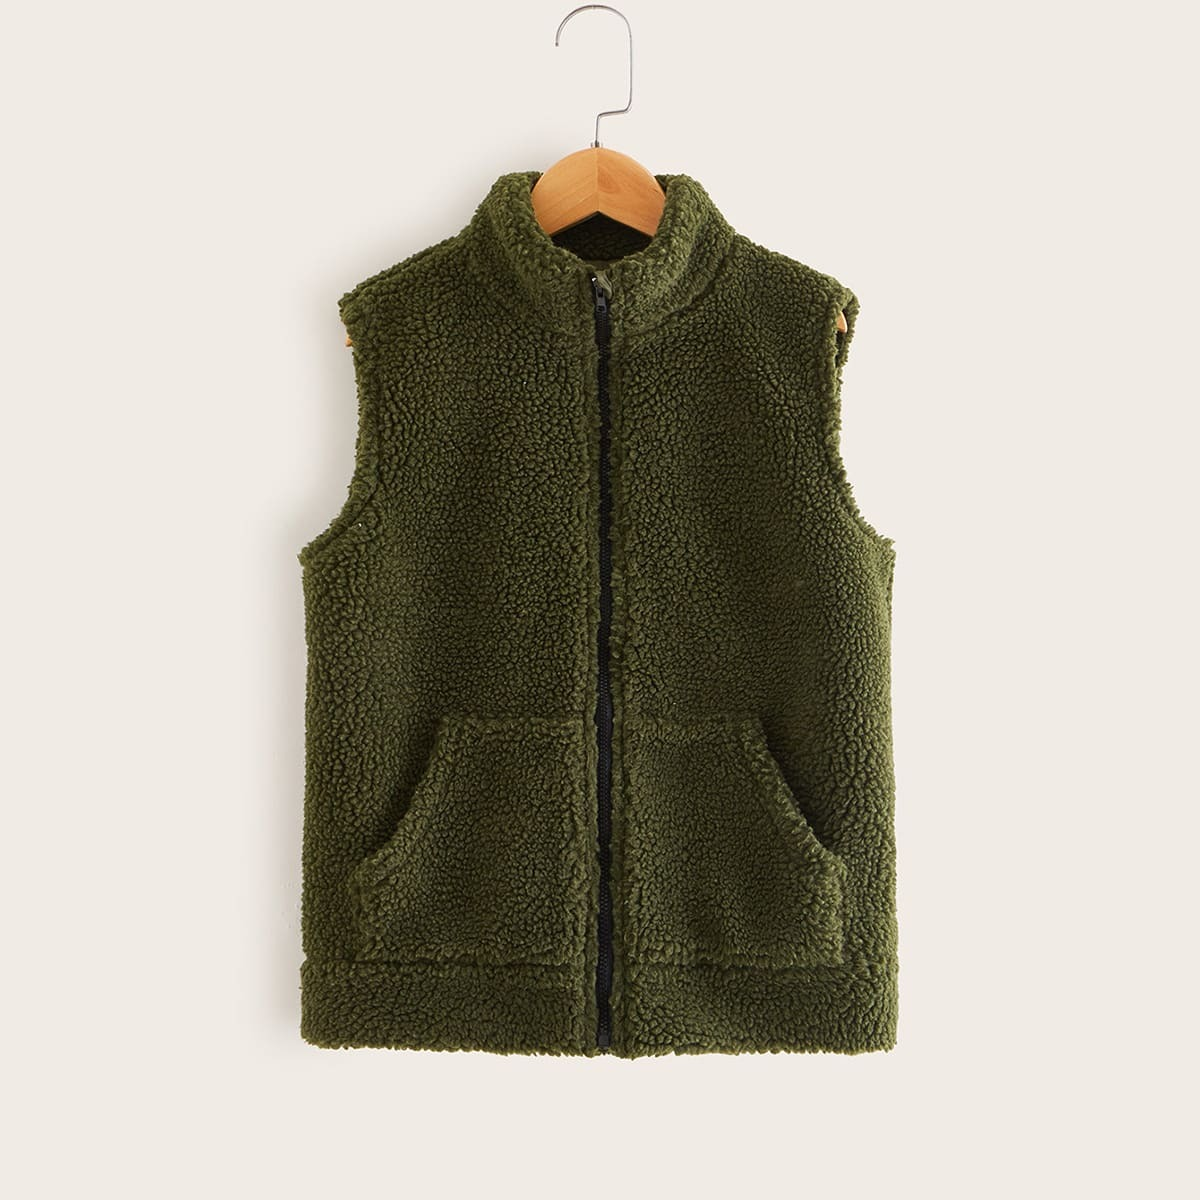 Leger groen Casual Vlak Jongens mantels en jassen Rits